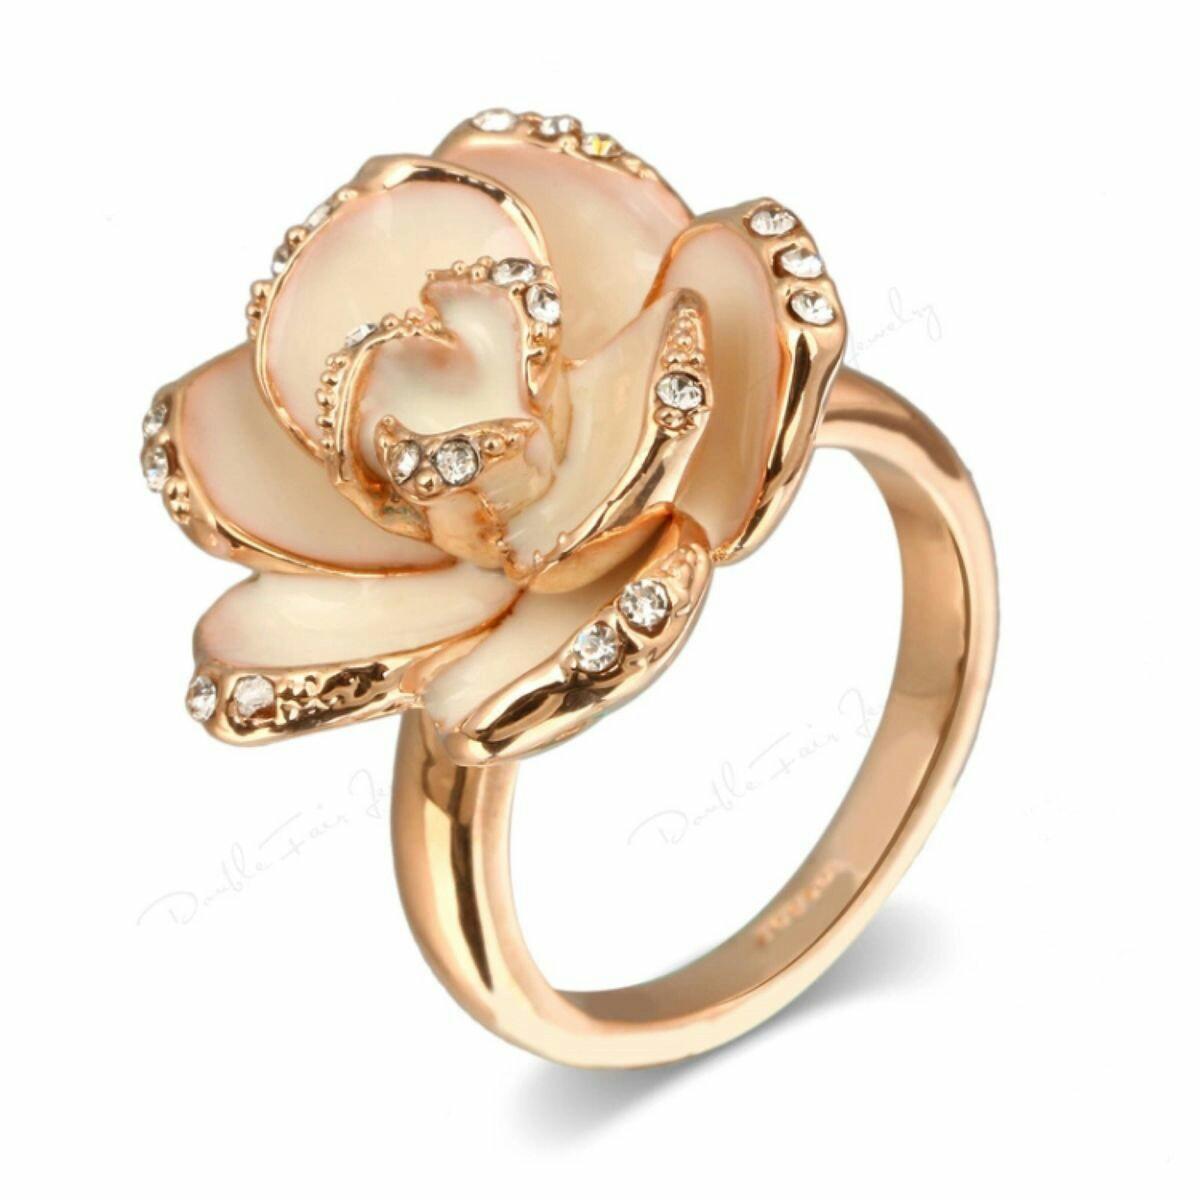 floral ring designs